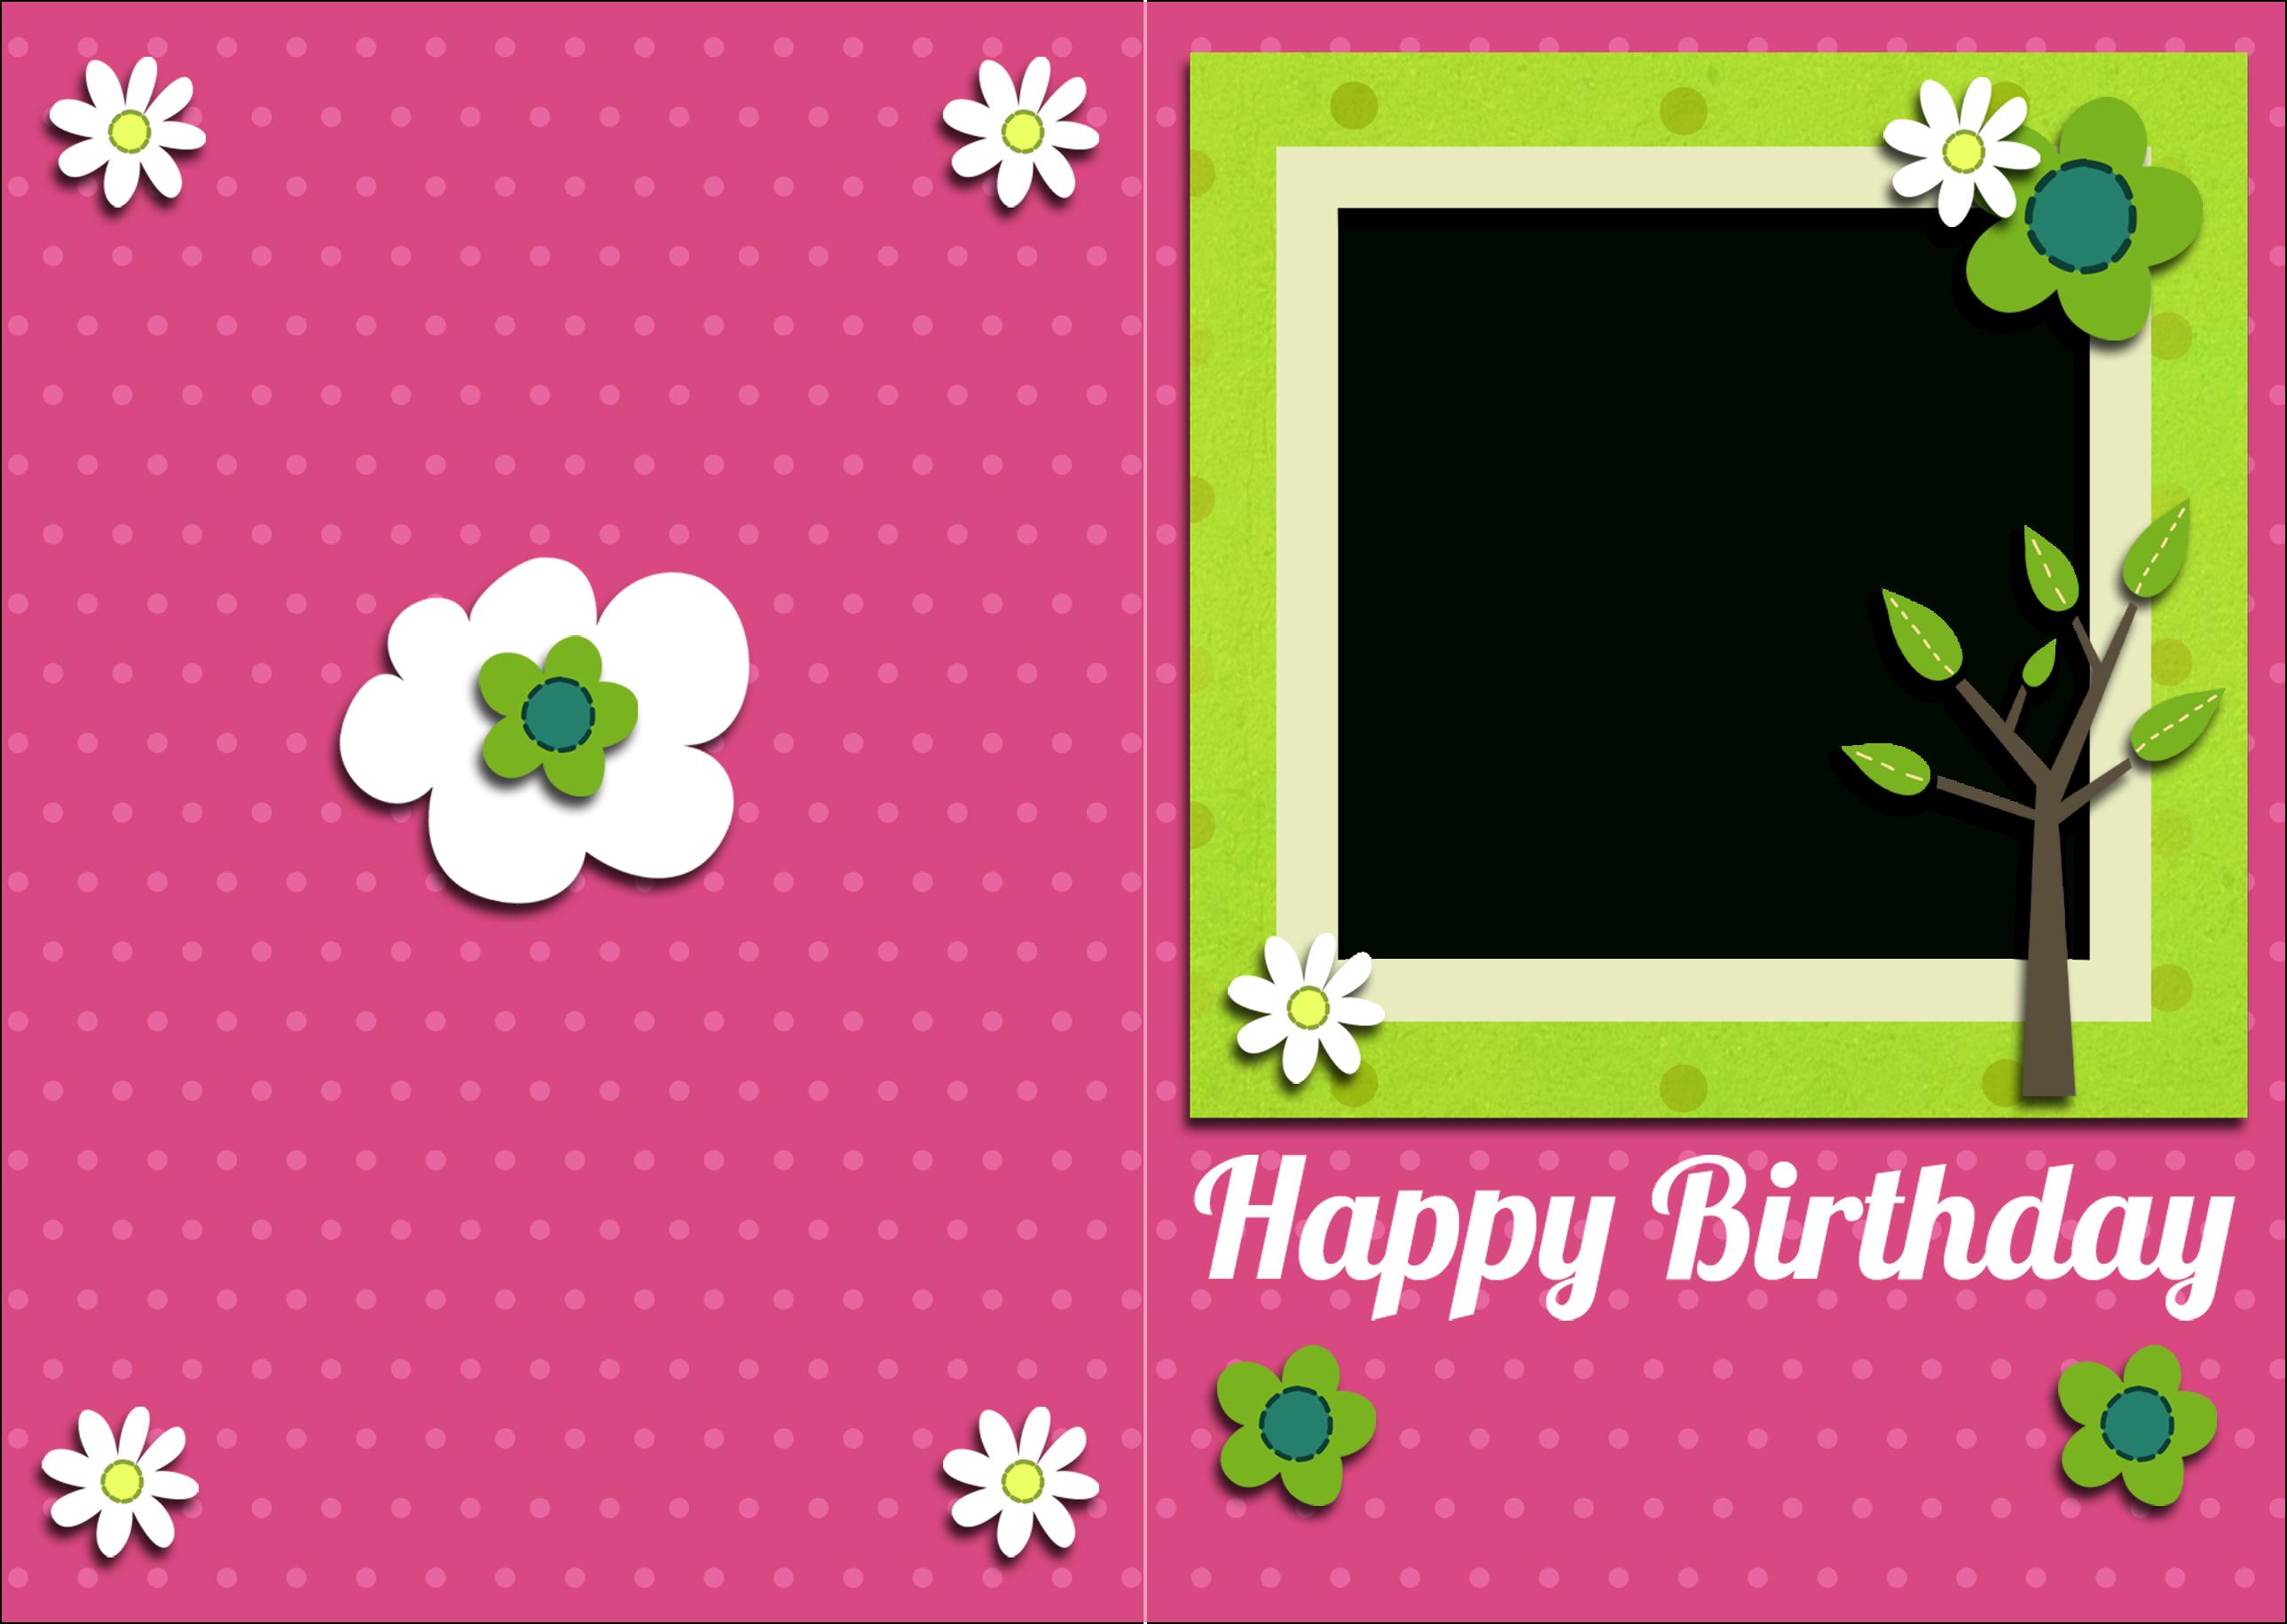 Printable Birthday Cards Hd Wallpapers Download Free Printable - Free Printable Cards Online